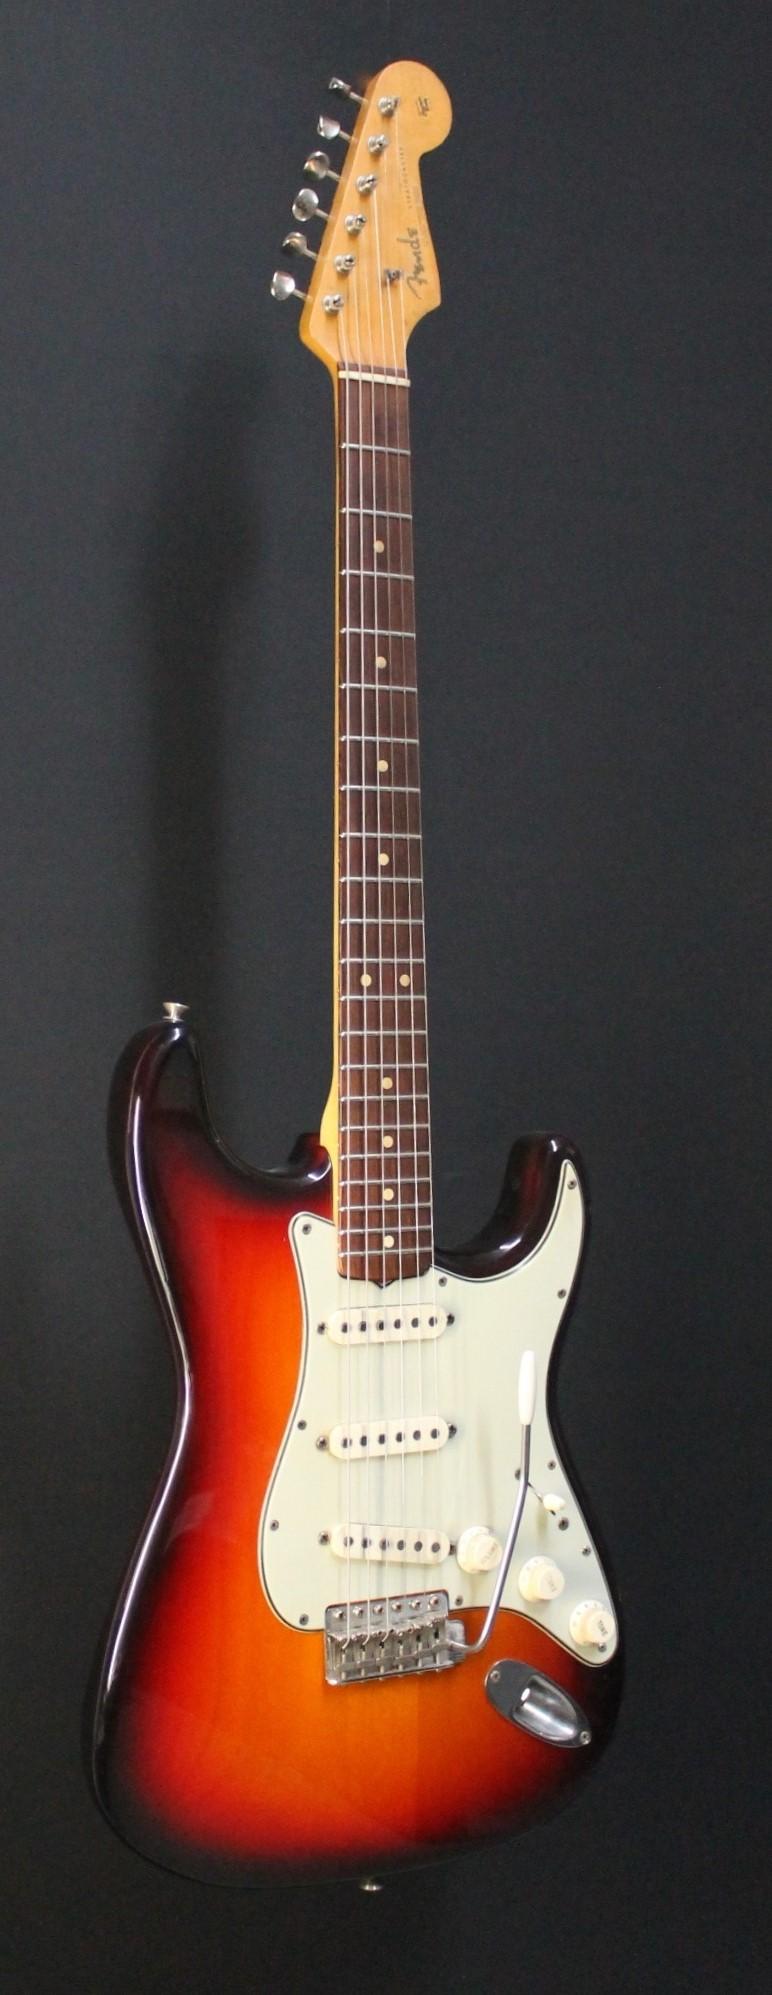 Fender Stratocaster Price >> Fender Stratocaster Price Reduce 1963 Guitar For Sale